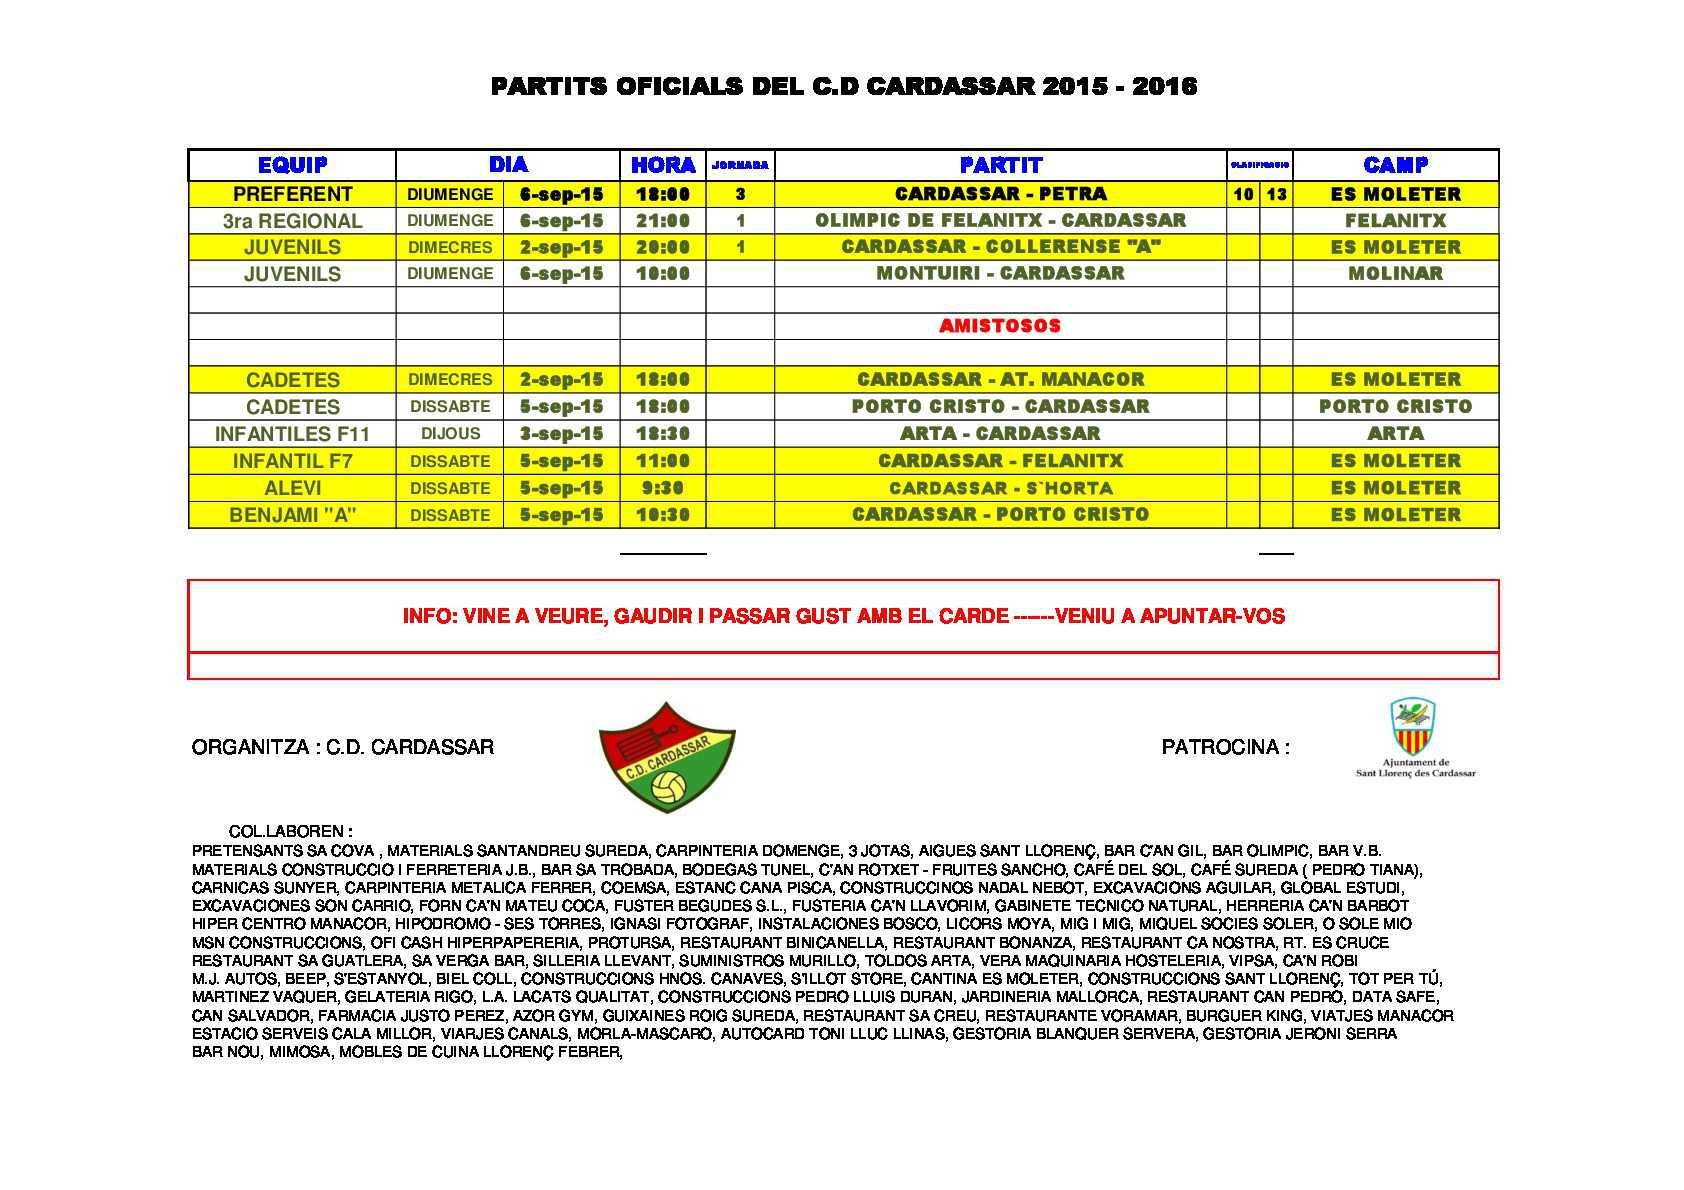 PARTIS OFICIAL - AMISTOSOS CARDE 2015-16 (3)-0